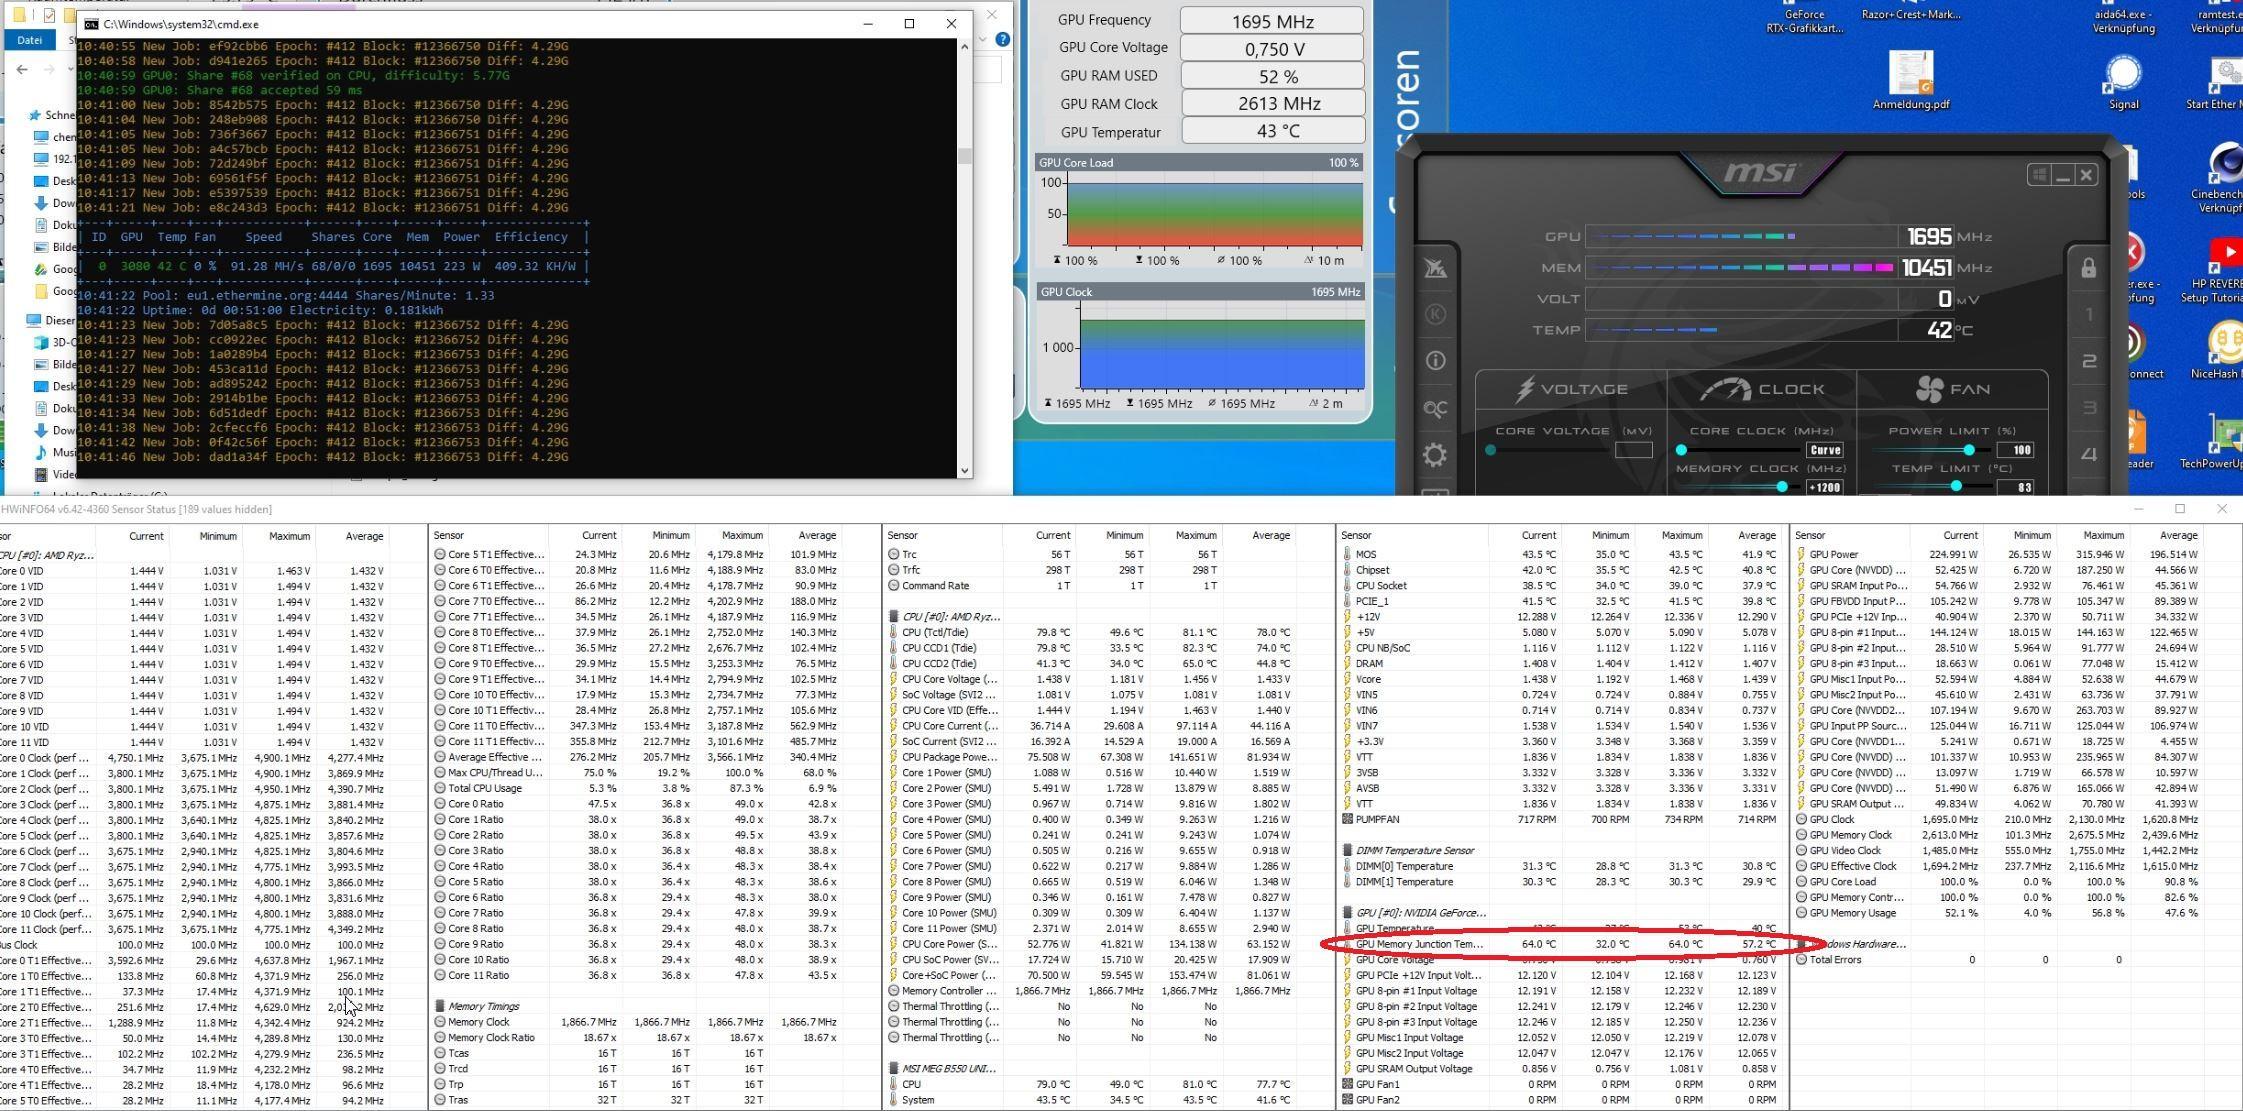 2021-05-04 10_41_49-Chemistry-PC - AnyDesk.jpg